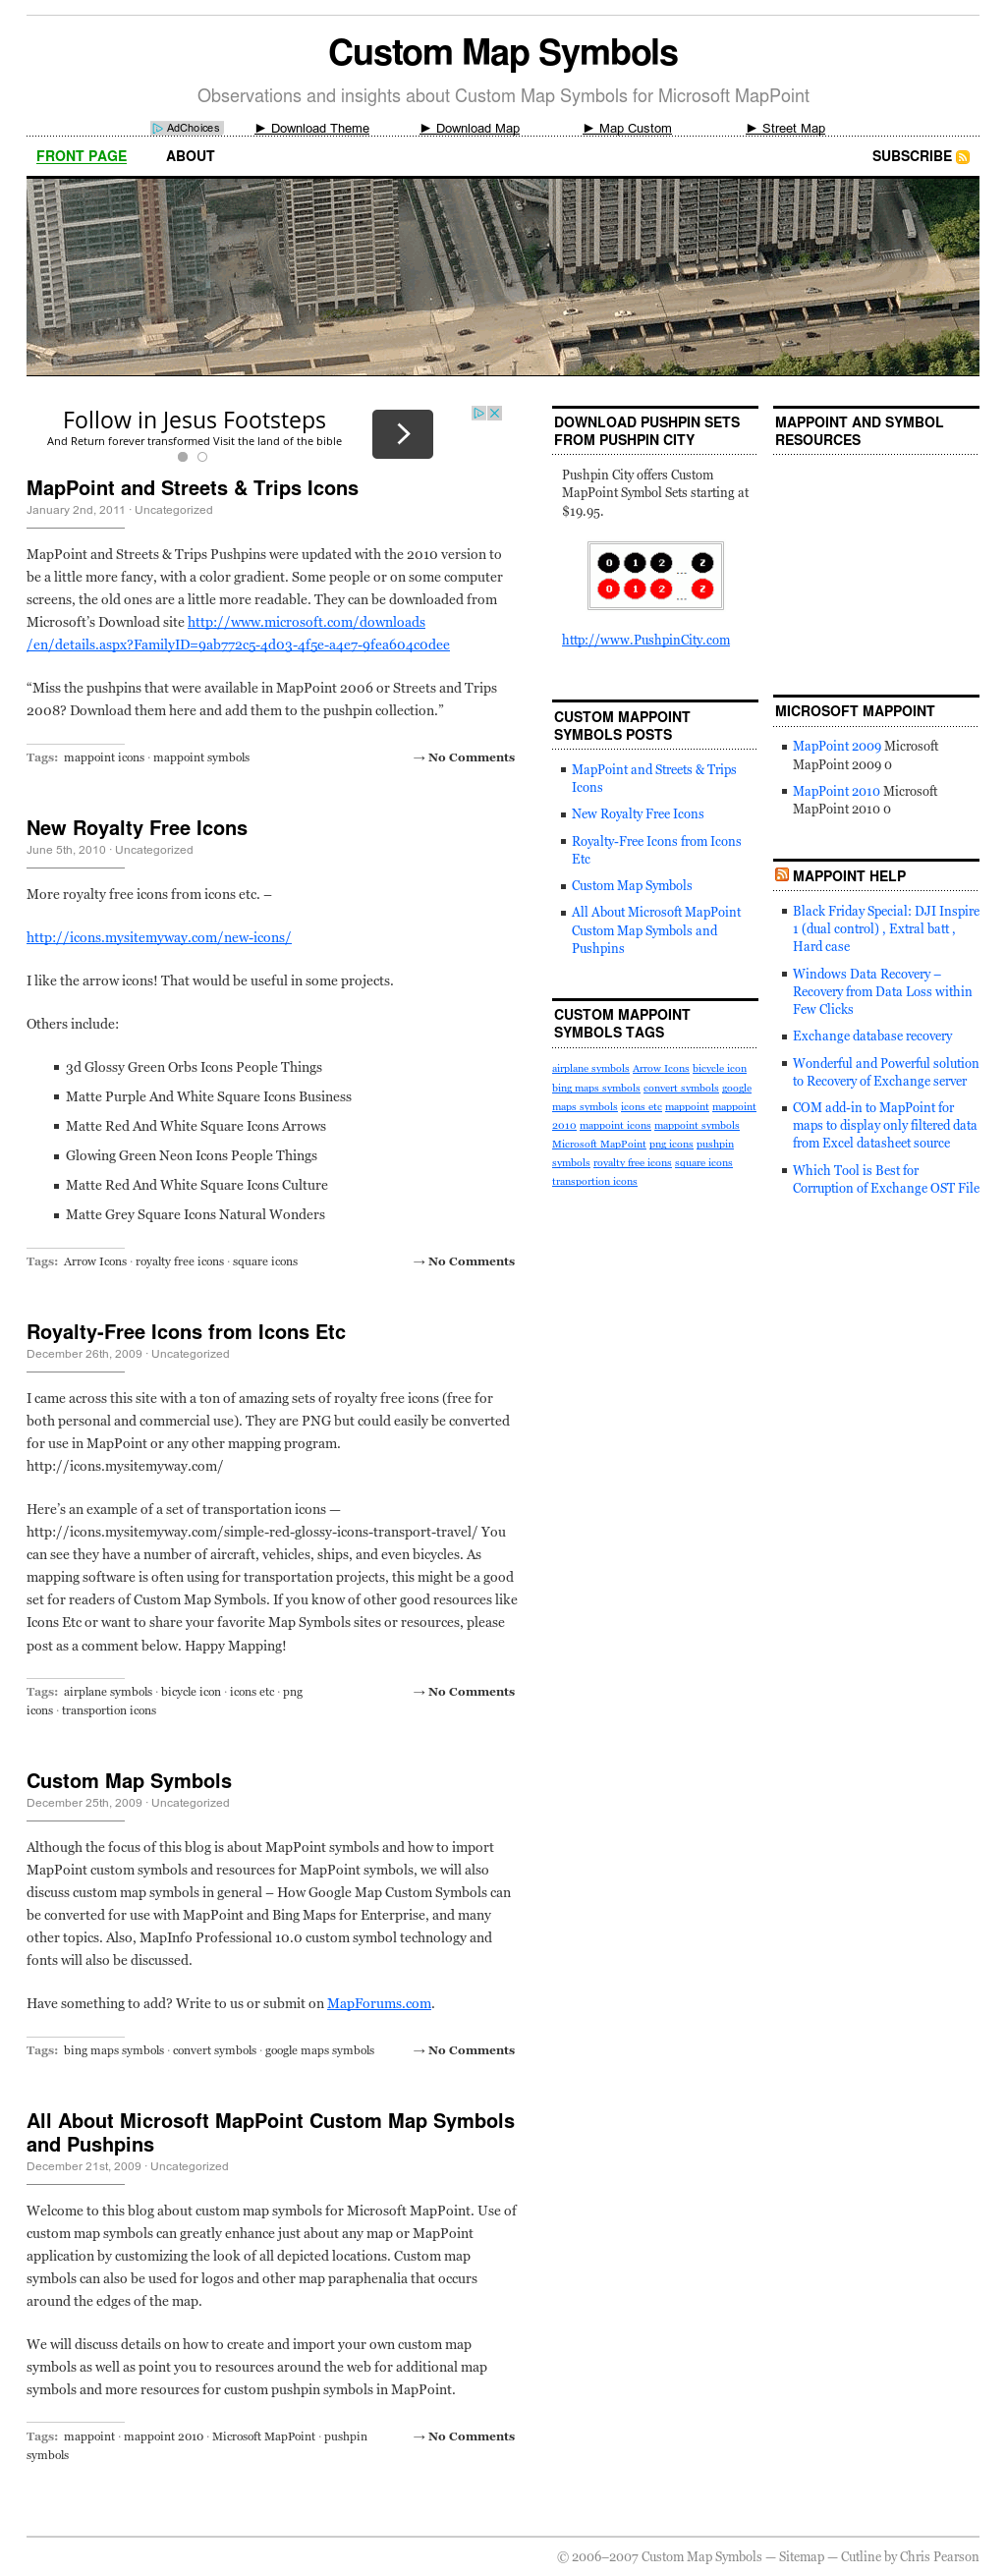 Custom Map Symbols Competitors, Revenue and Employees - Owler